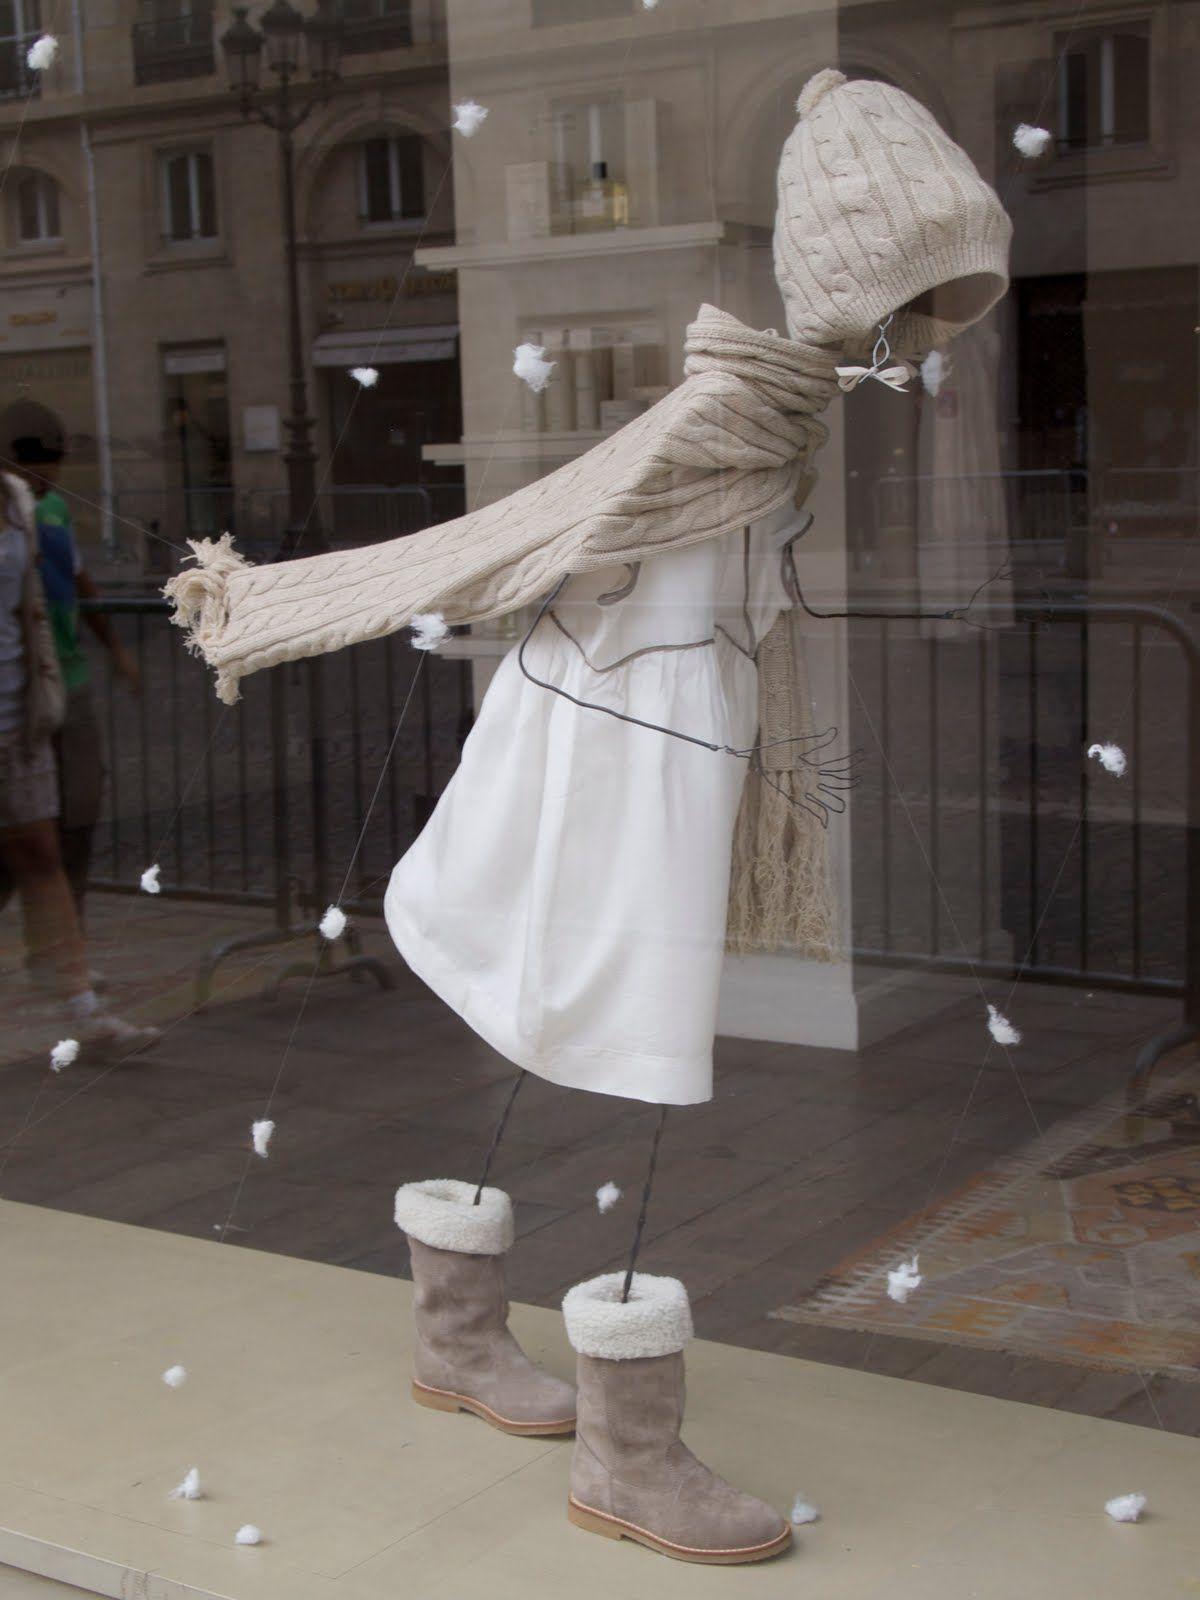 cute wirey mannequin, snowy display..